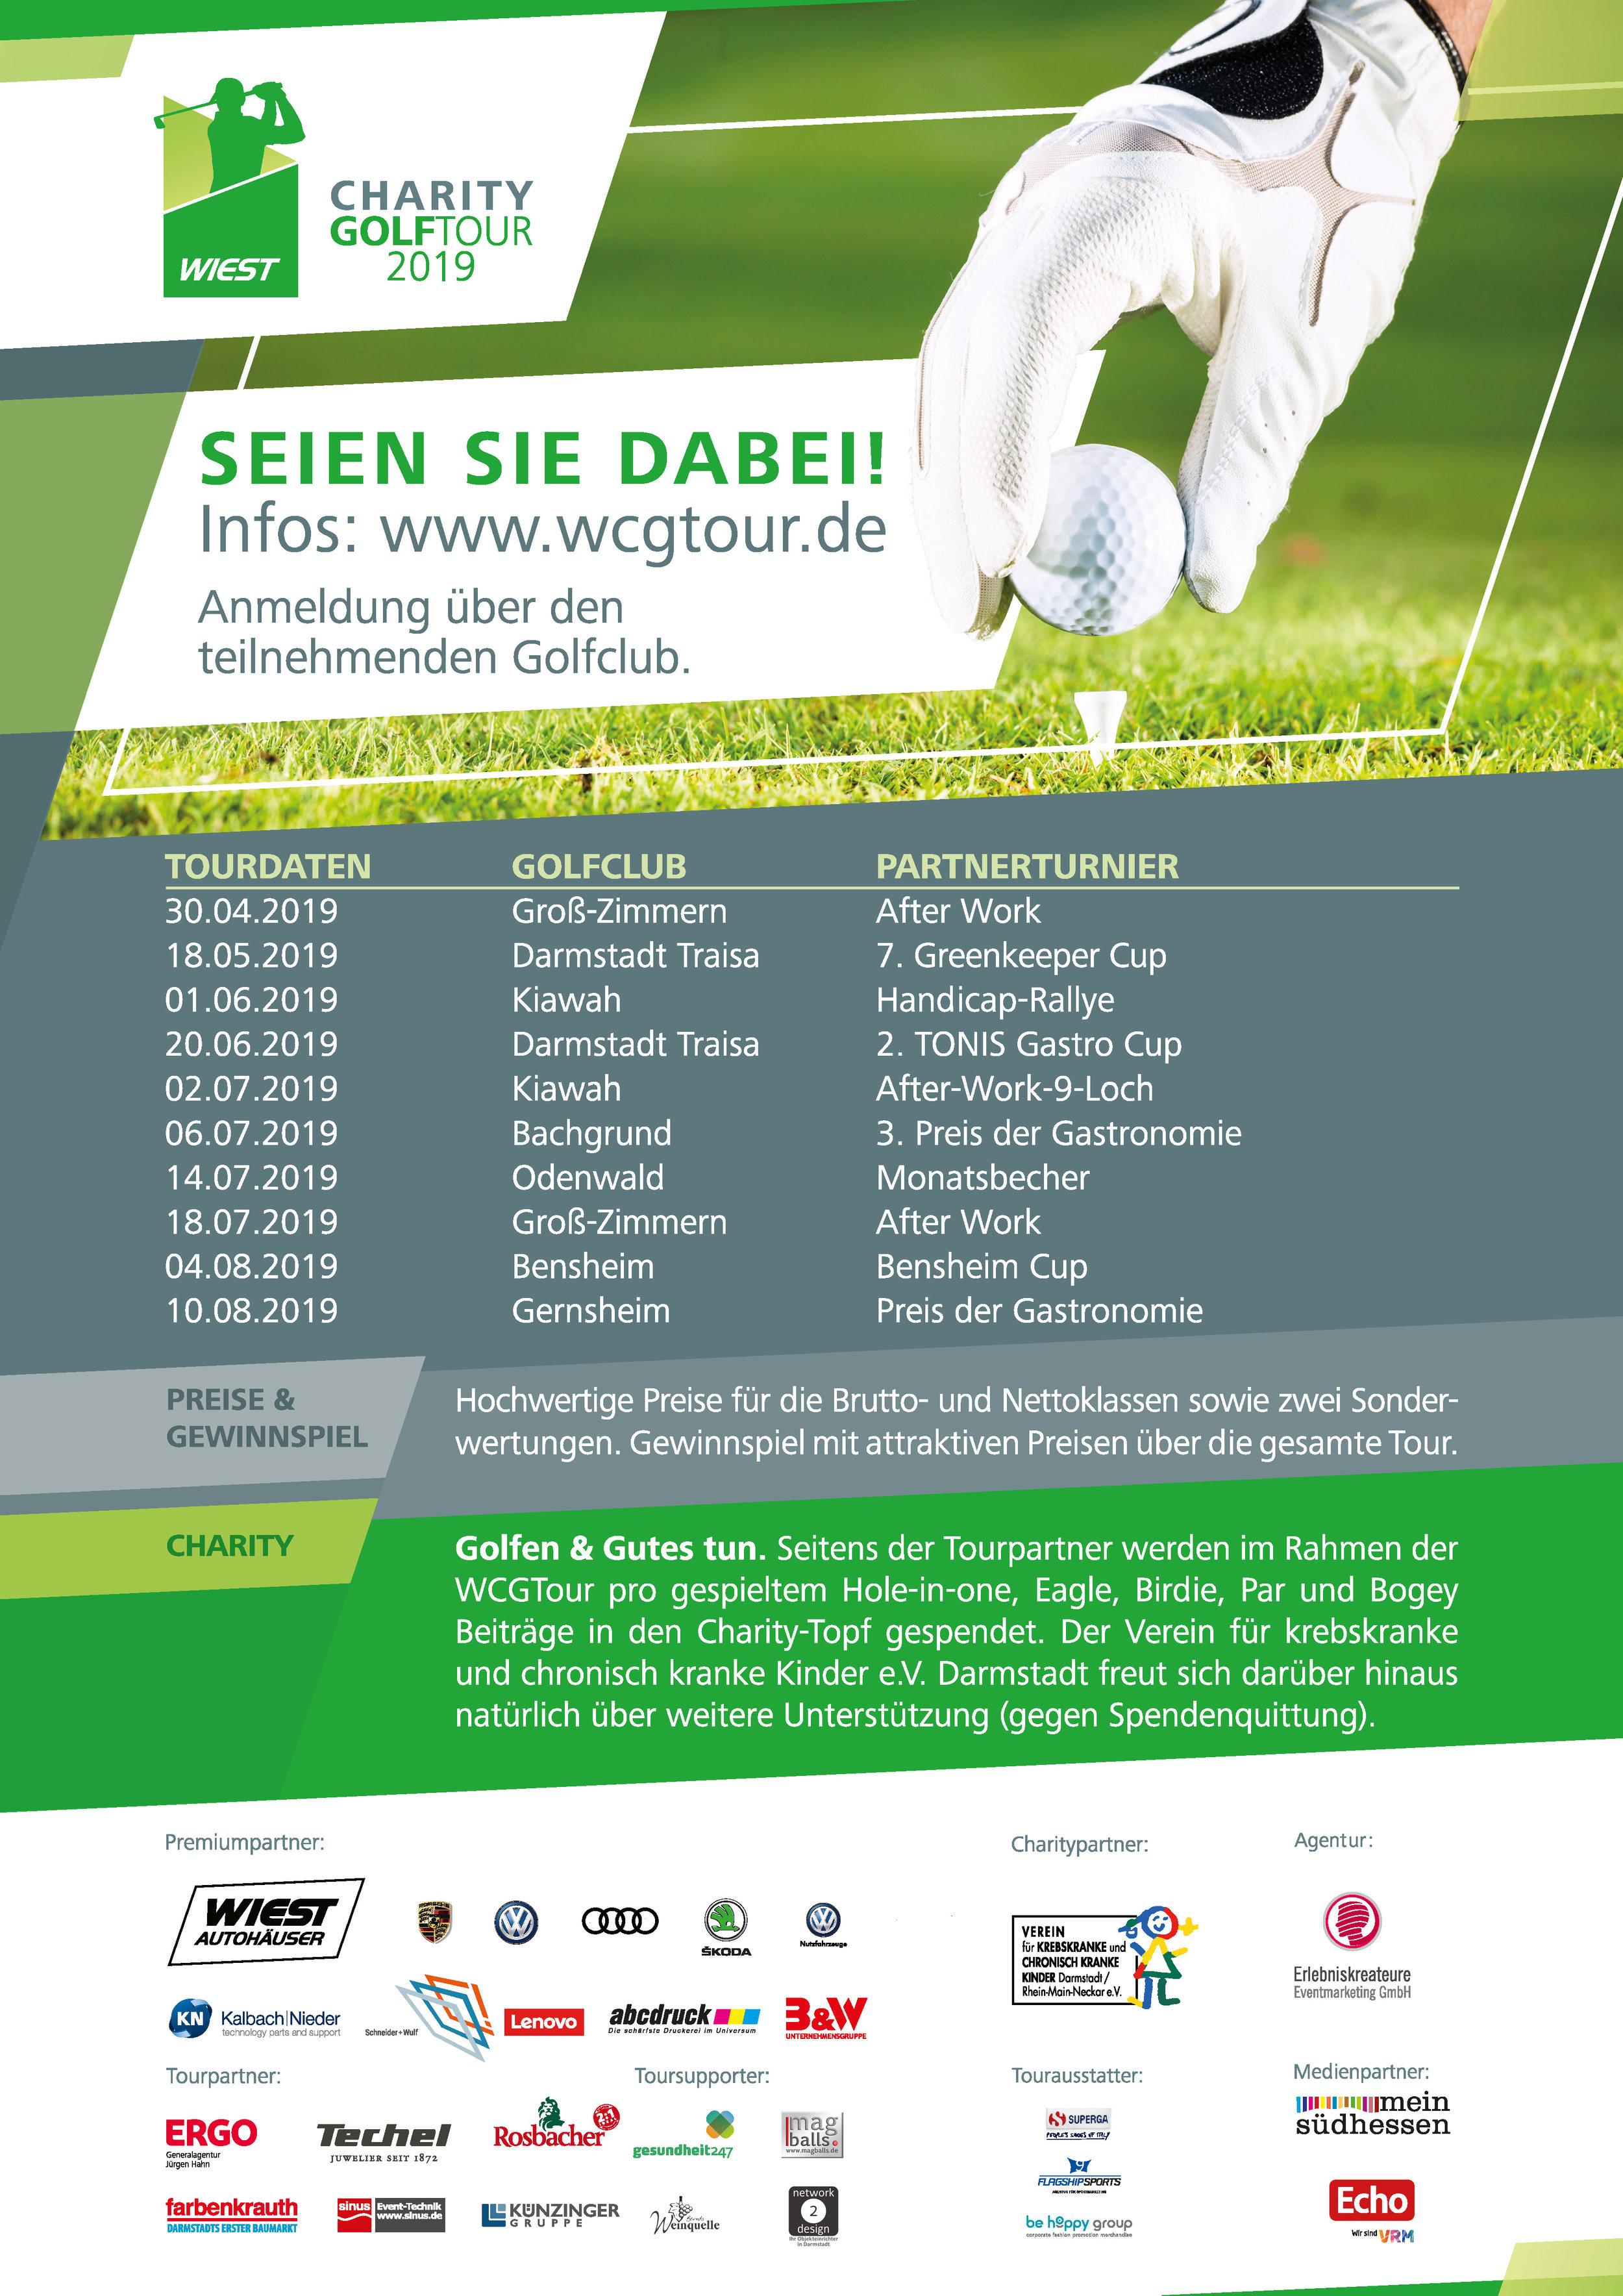 WCGTour2019 - Plakat DinA3 mit Sponsoren.jpg